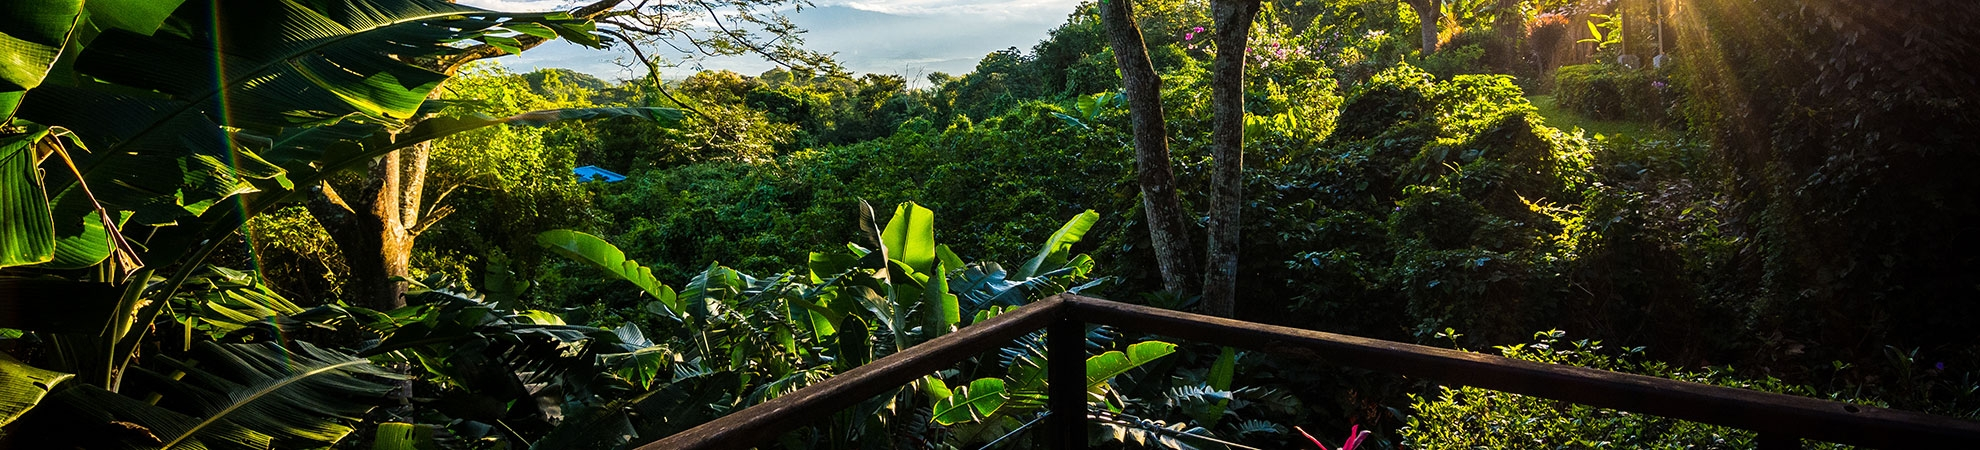 Voyage Pacuare - Costa Rica